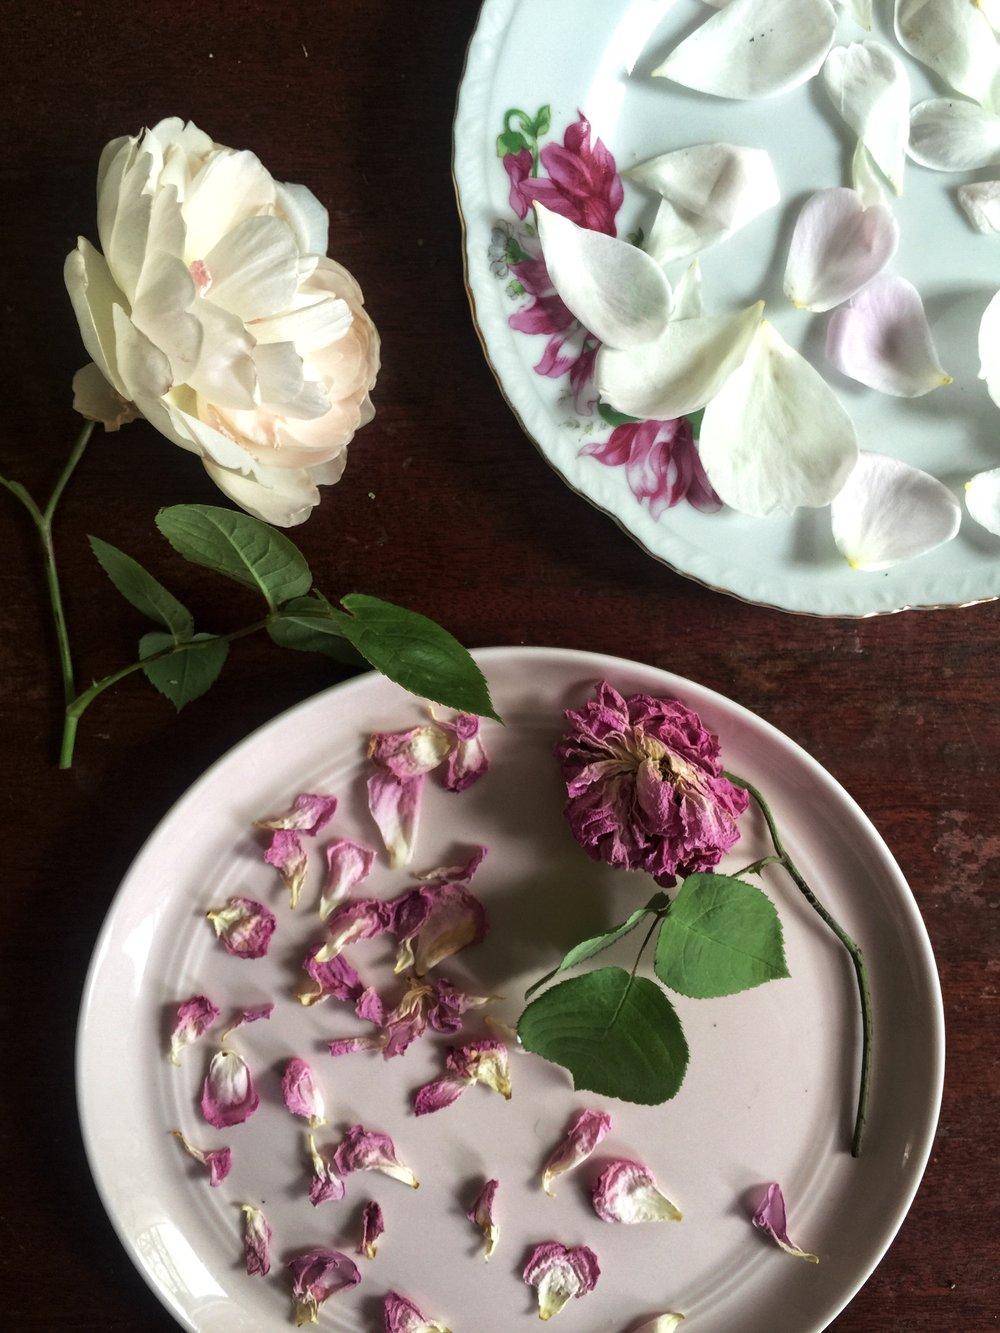 ROSE & IVY Journal Drying Rose Petals